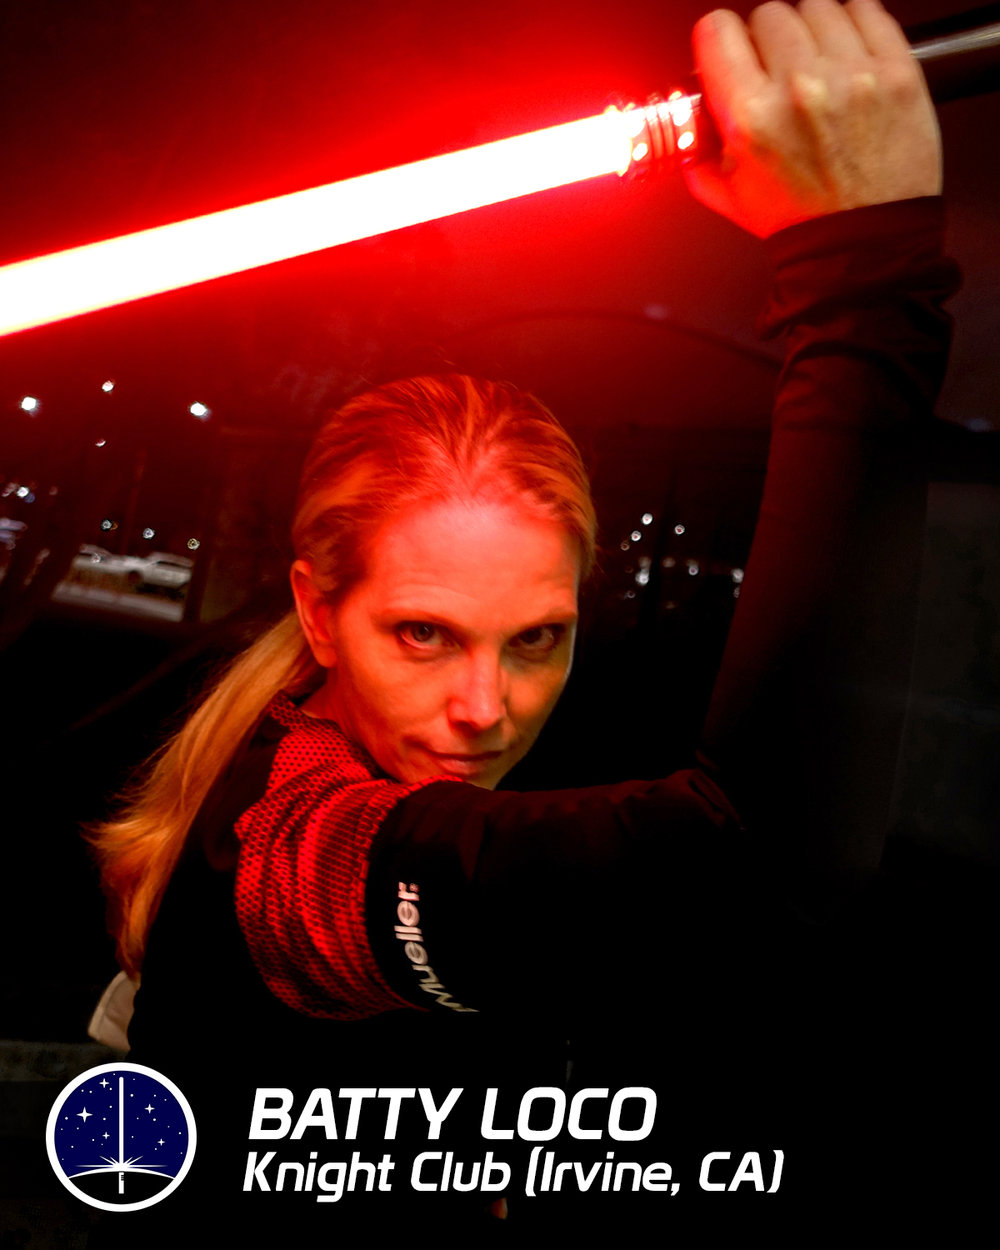 BattyLoco180914.jpg